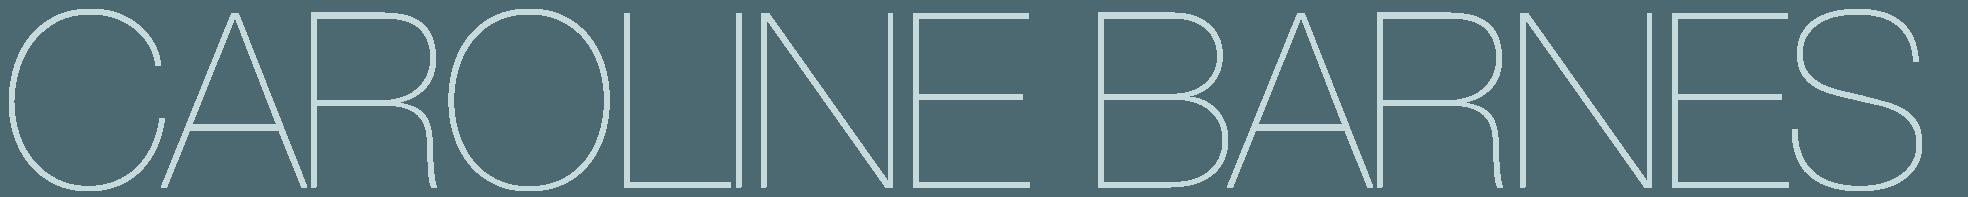 Tidal Studios | Caroline Barnes Makeup Artist logo